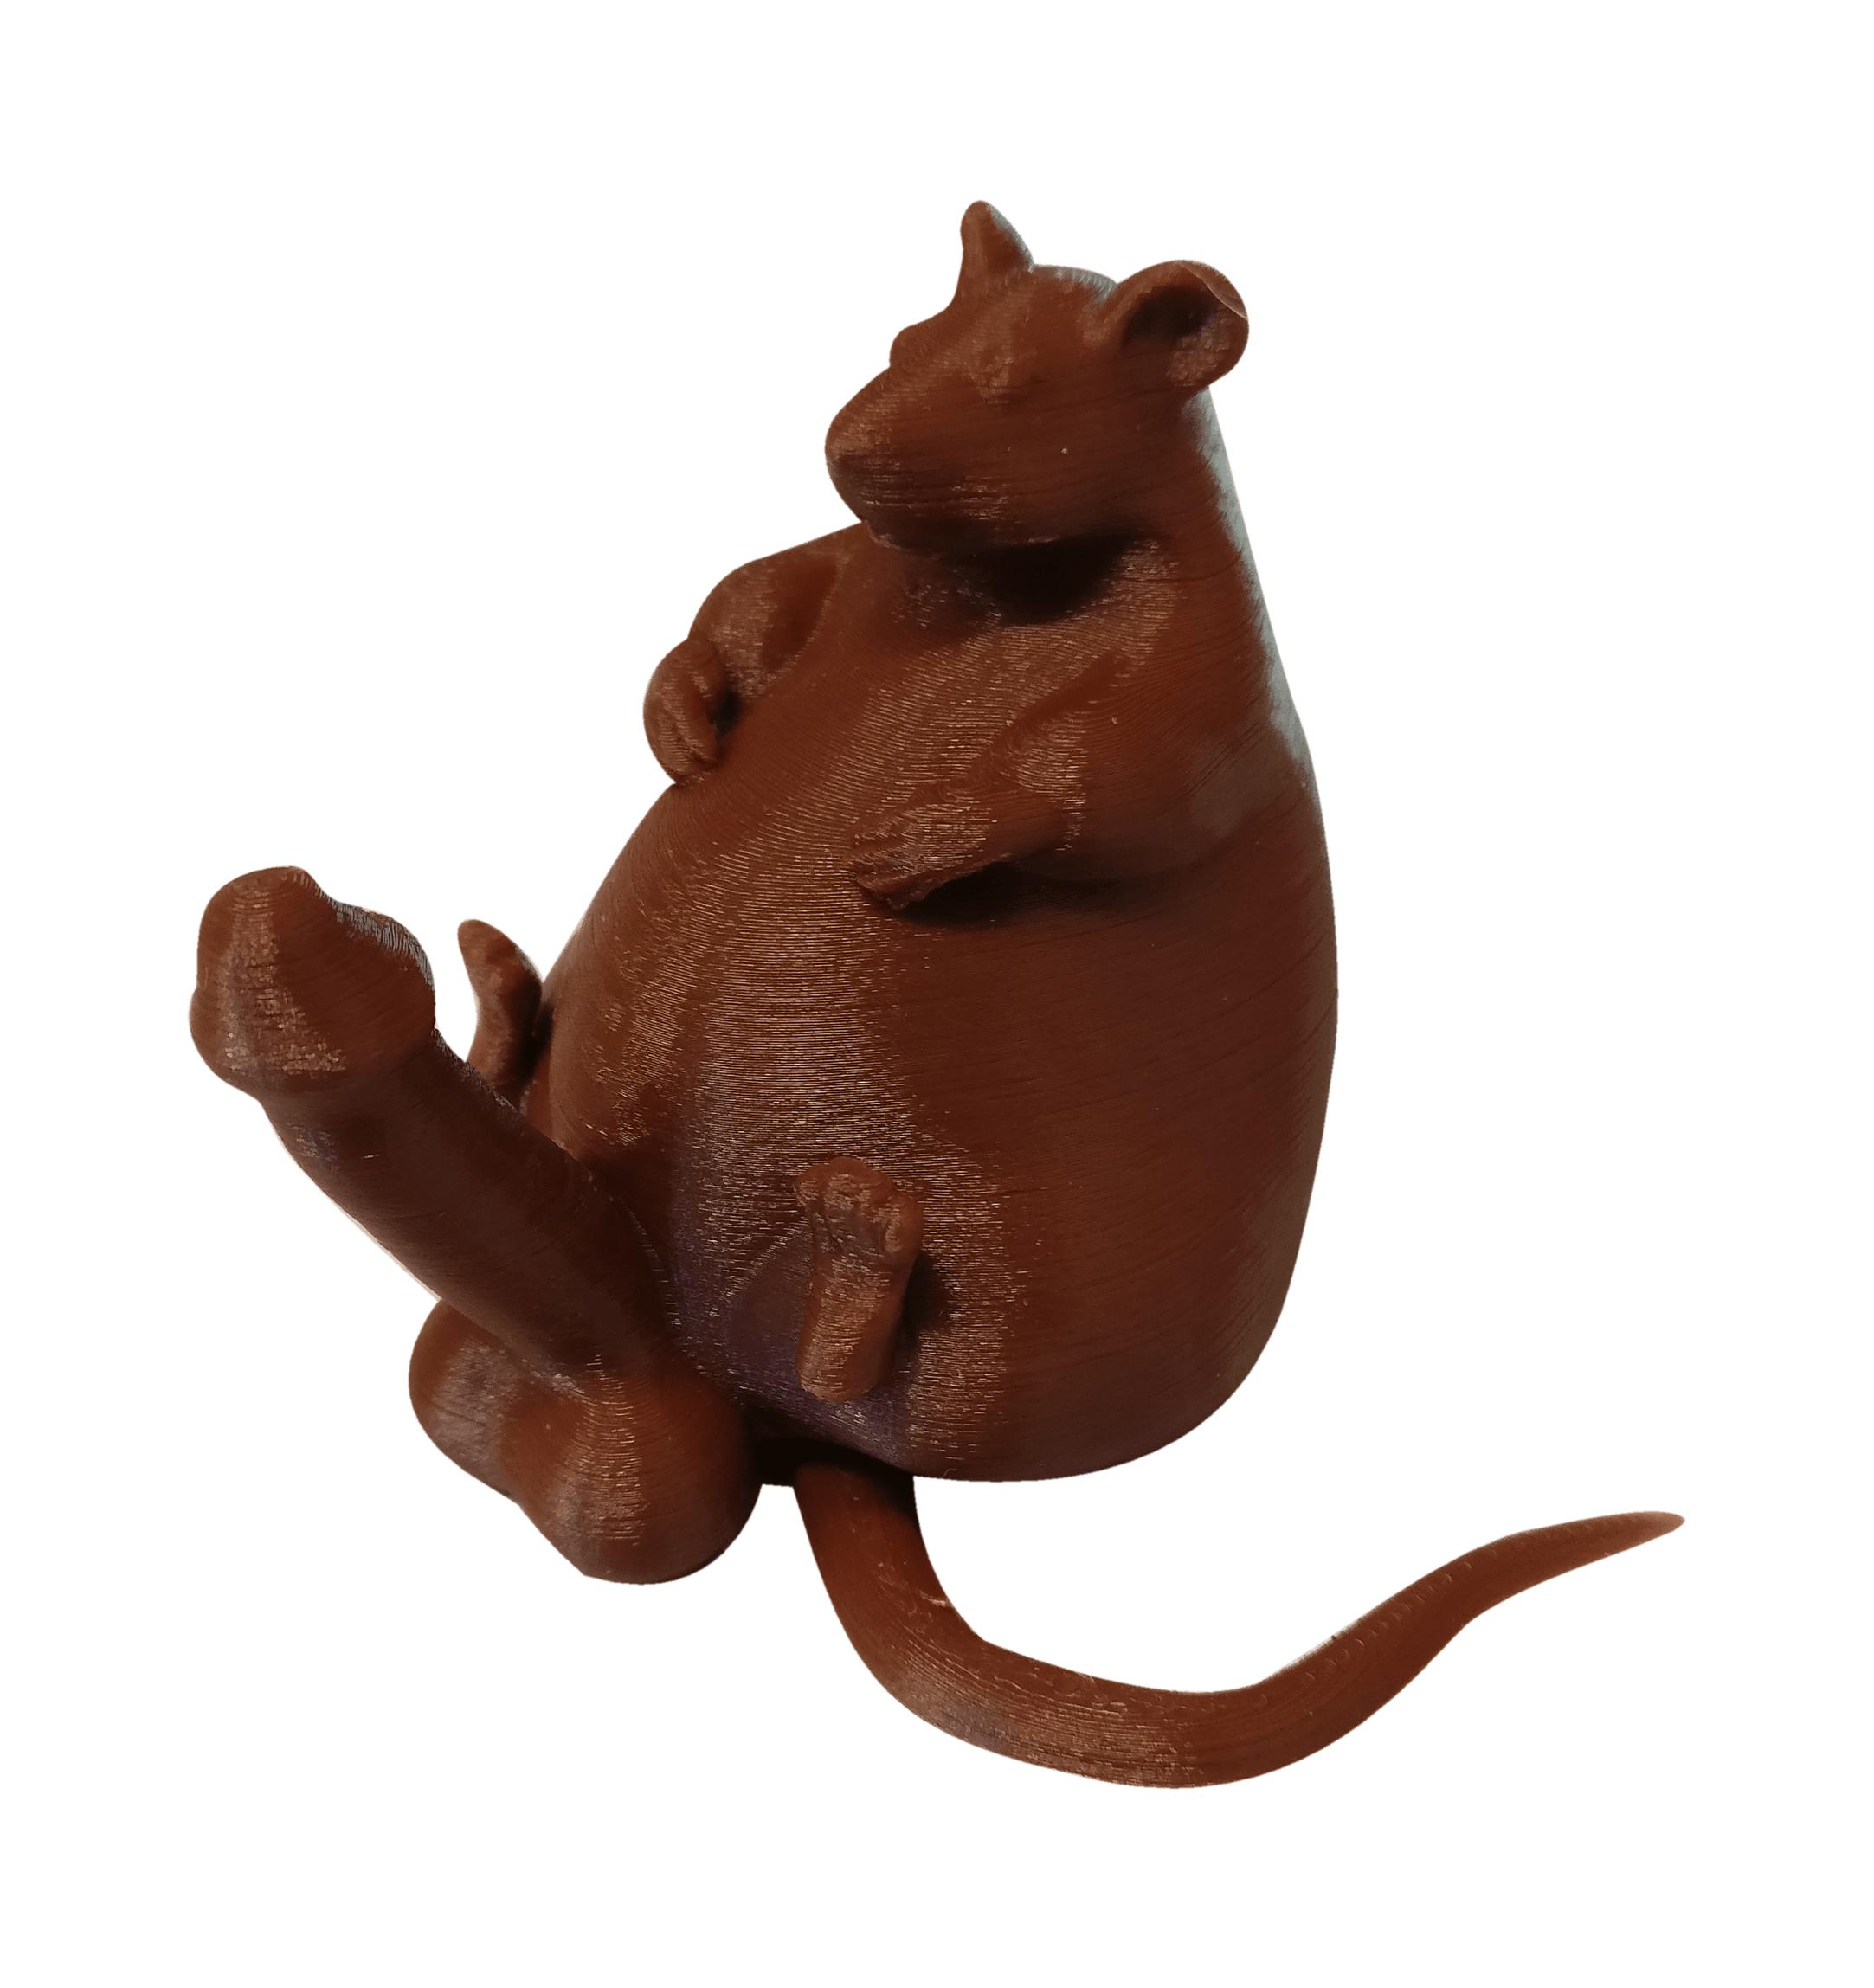 rat-bite.png Download free STL file The rat-bite by JMS • 3D print template, Jean-Michel_Sinep